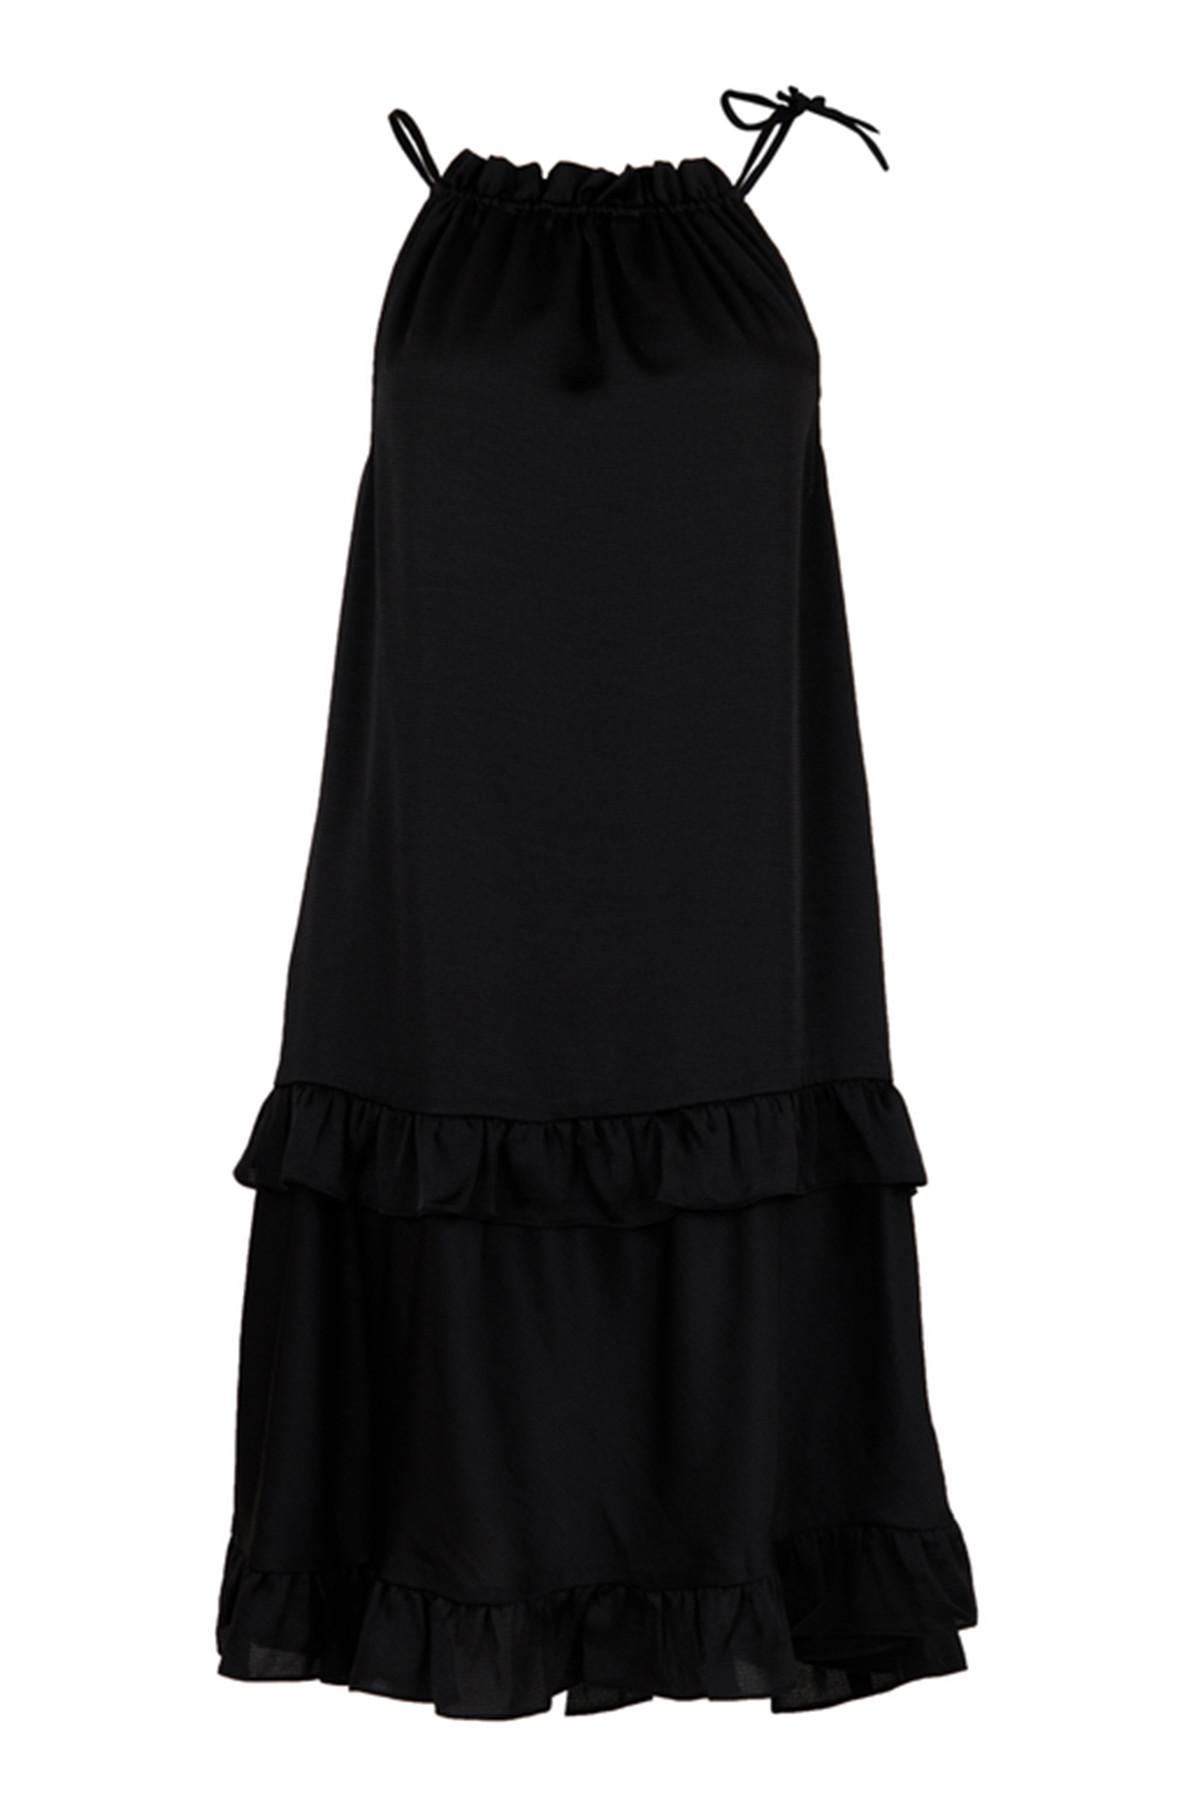 dc1db7dd NEO NOIR • NEO NOIR ALASKA DRESS 150976 • Price 69.95